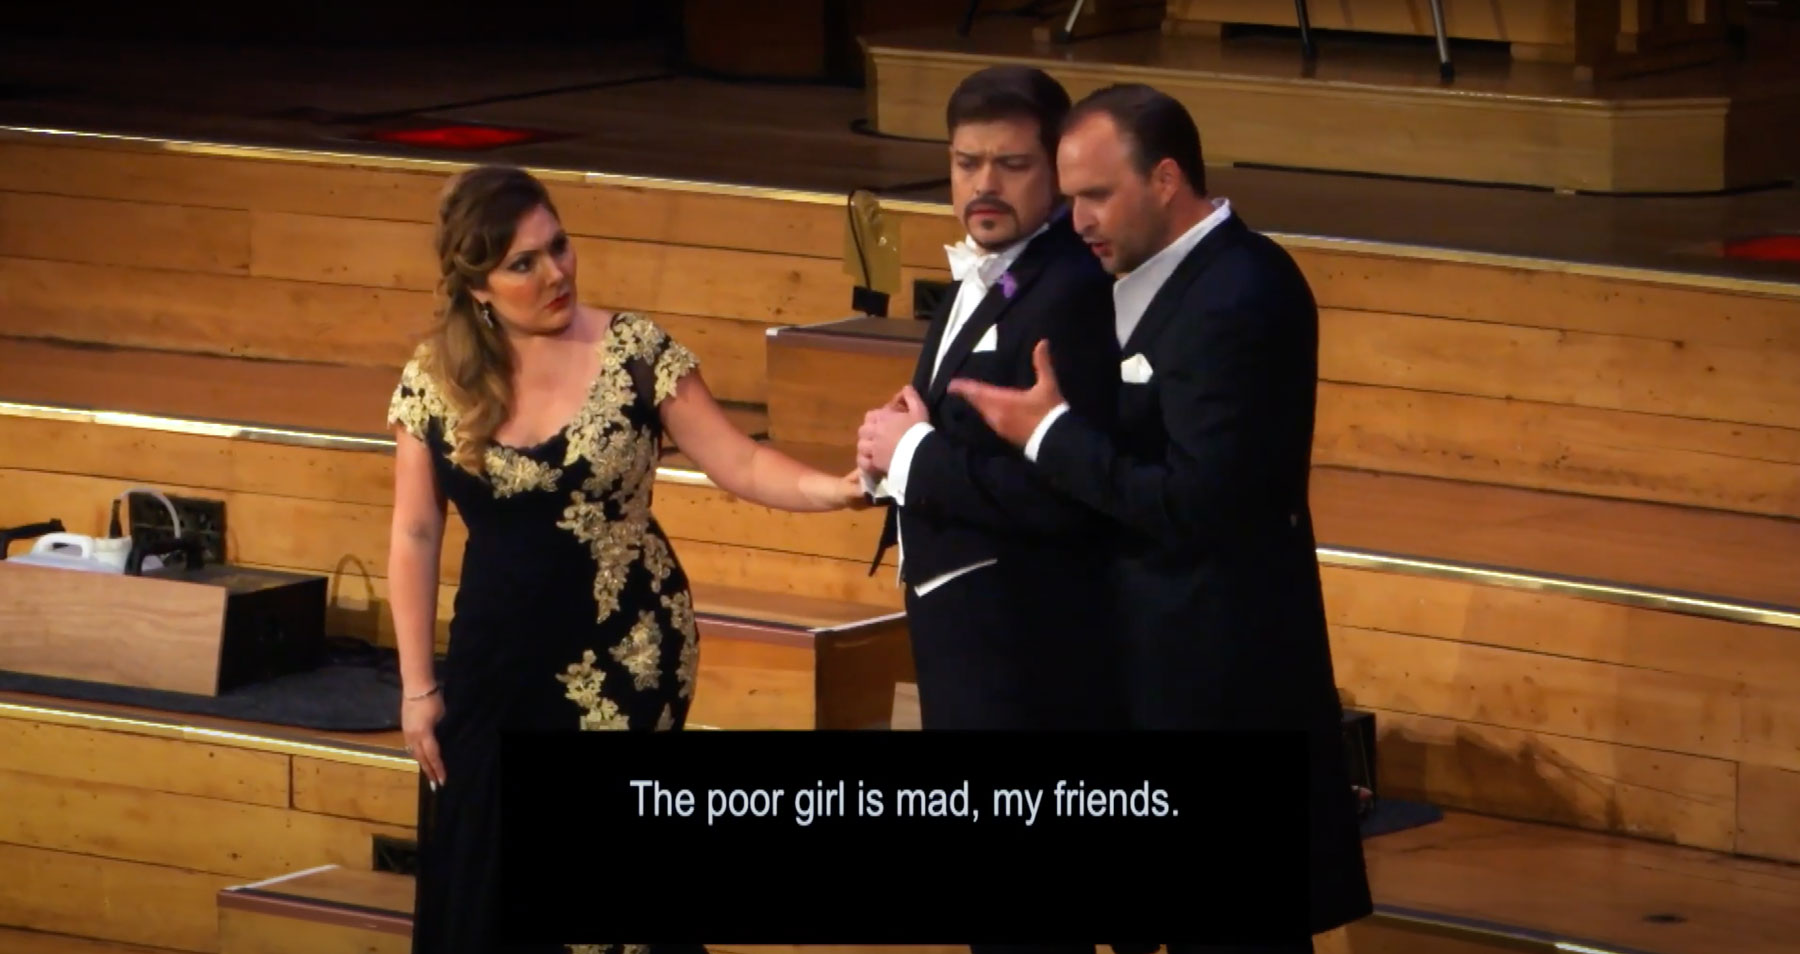 Richard Šveda-Don Giovanni – Cut the scenes